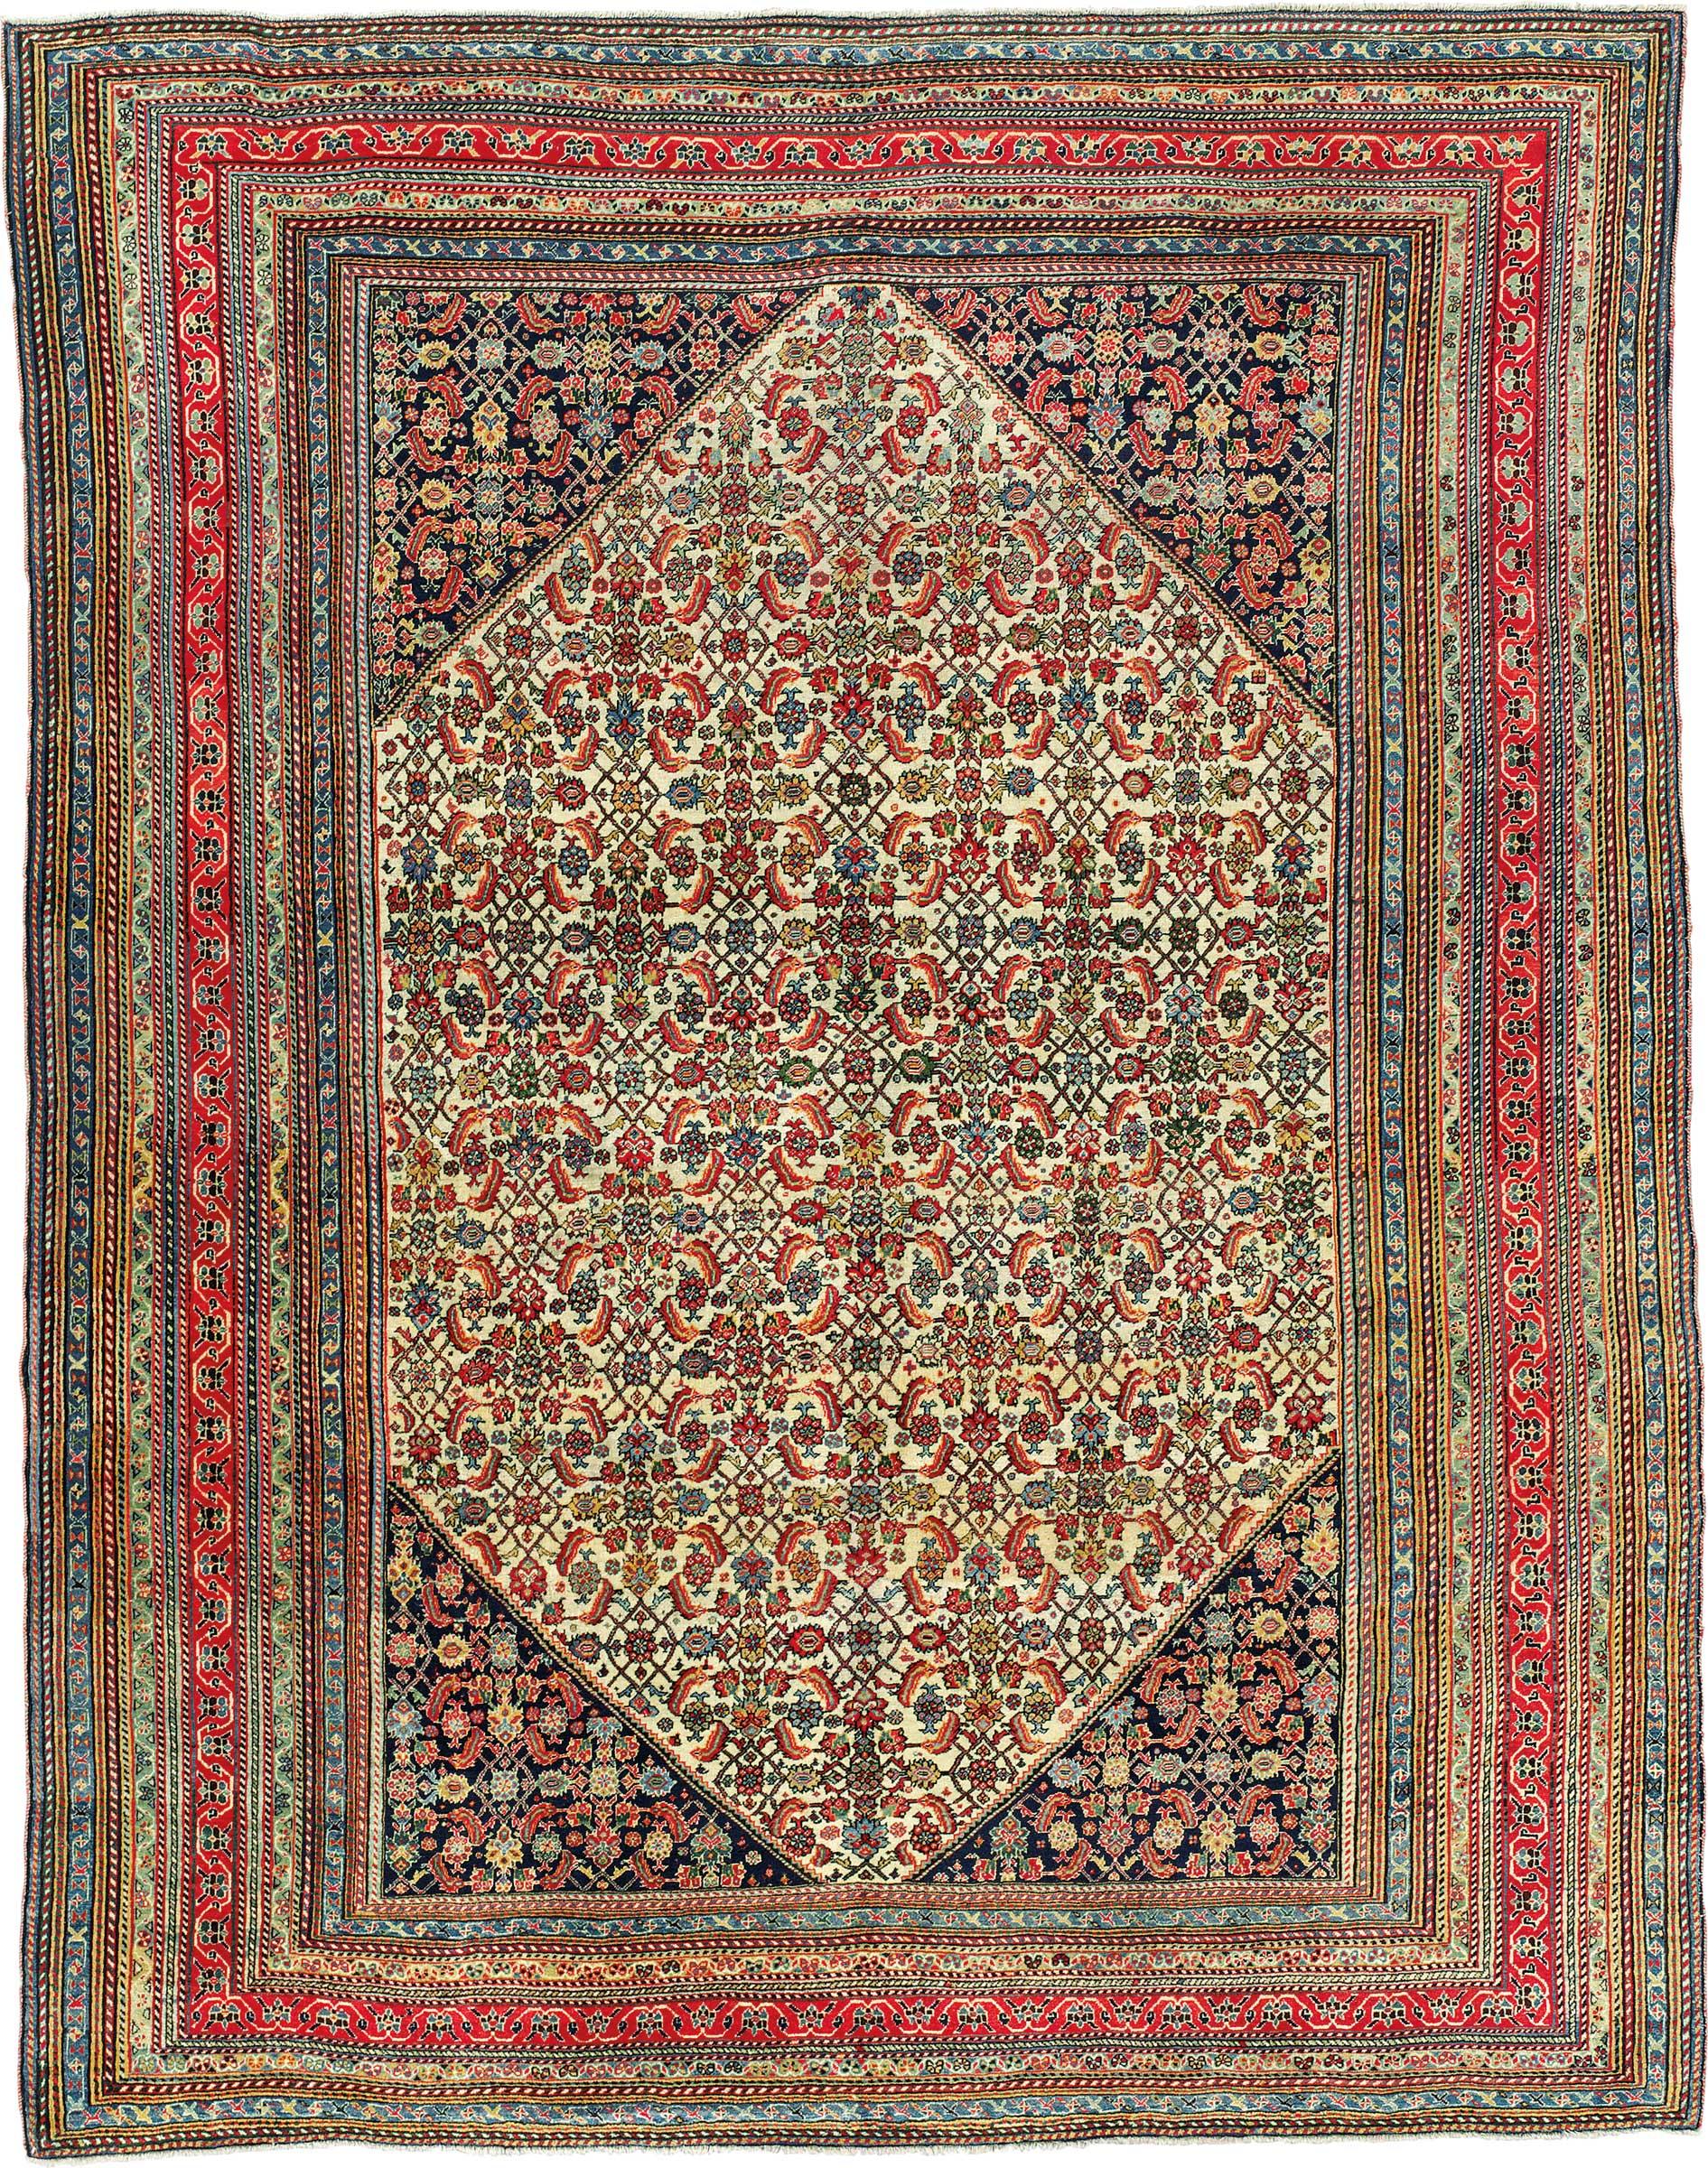 oriental carpets a qashqai rug. south persia, circa 1890. 8ft 1 in x 6ft 3 SOZATND